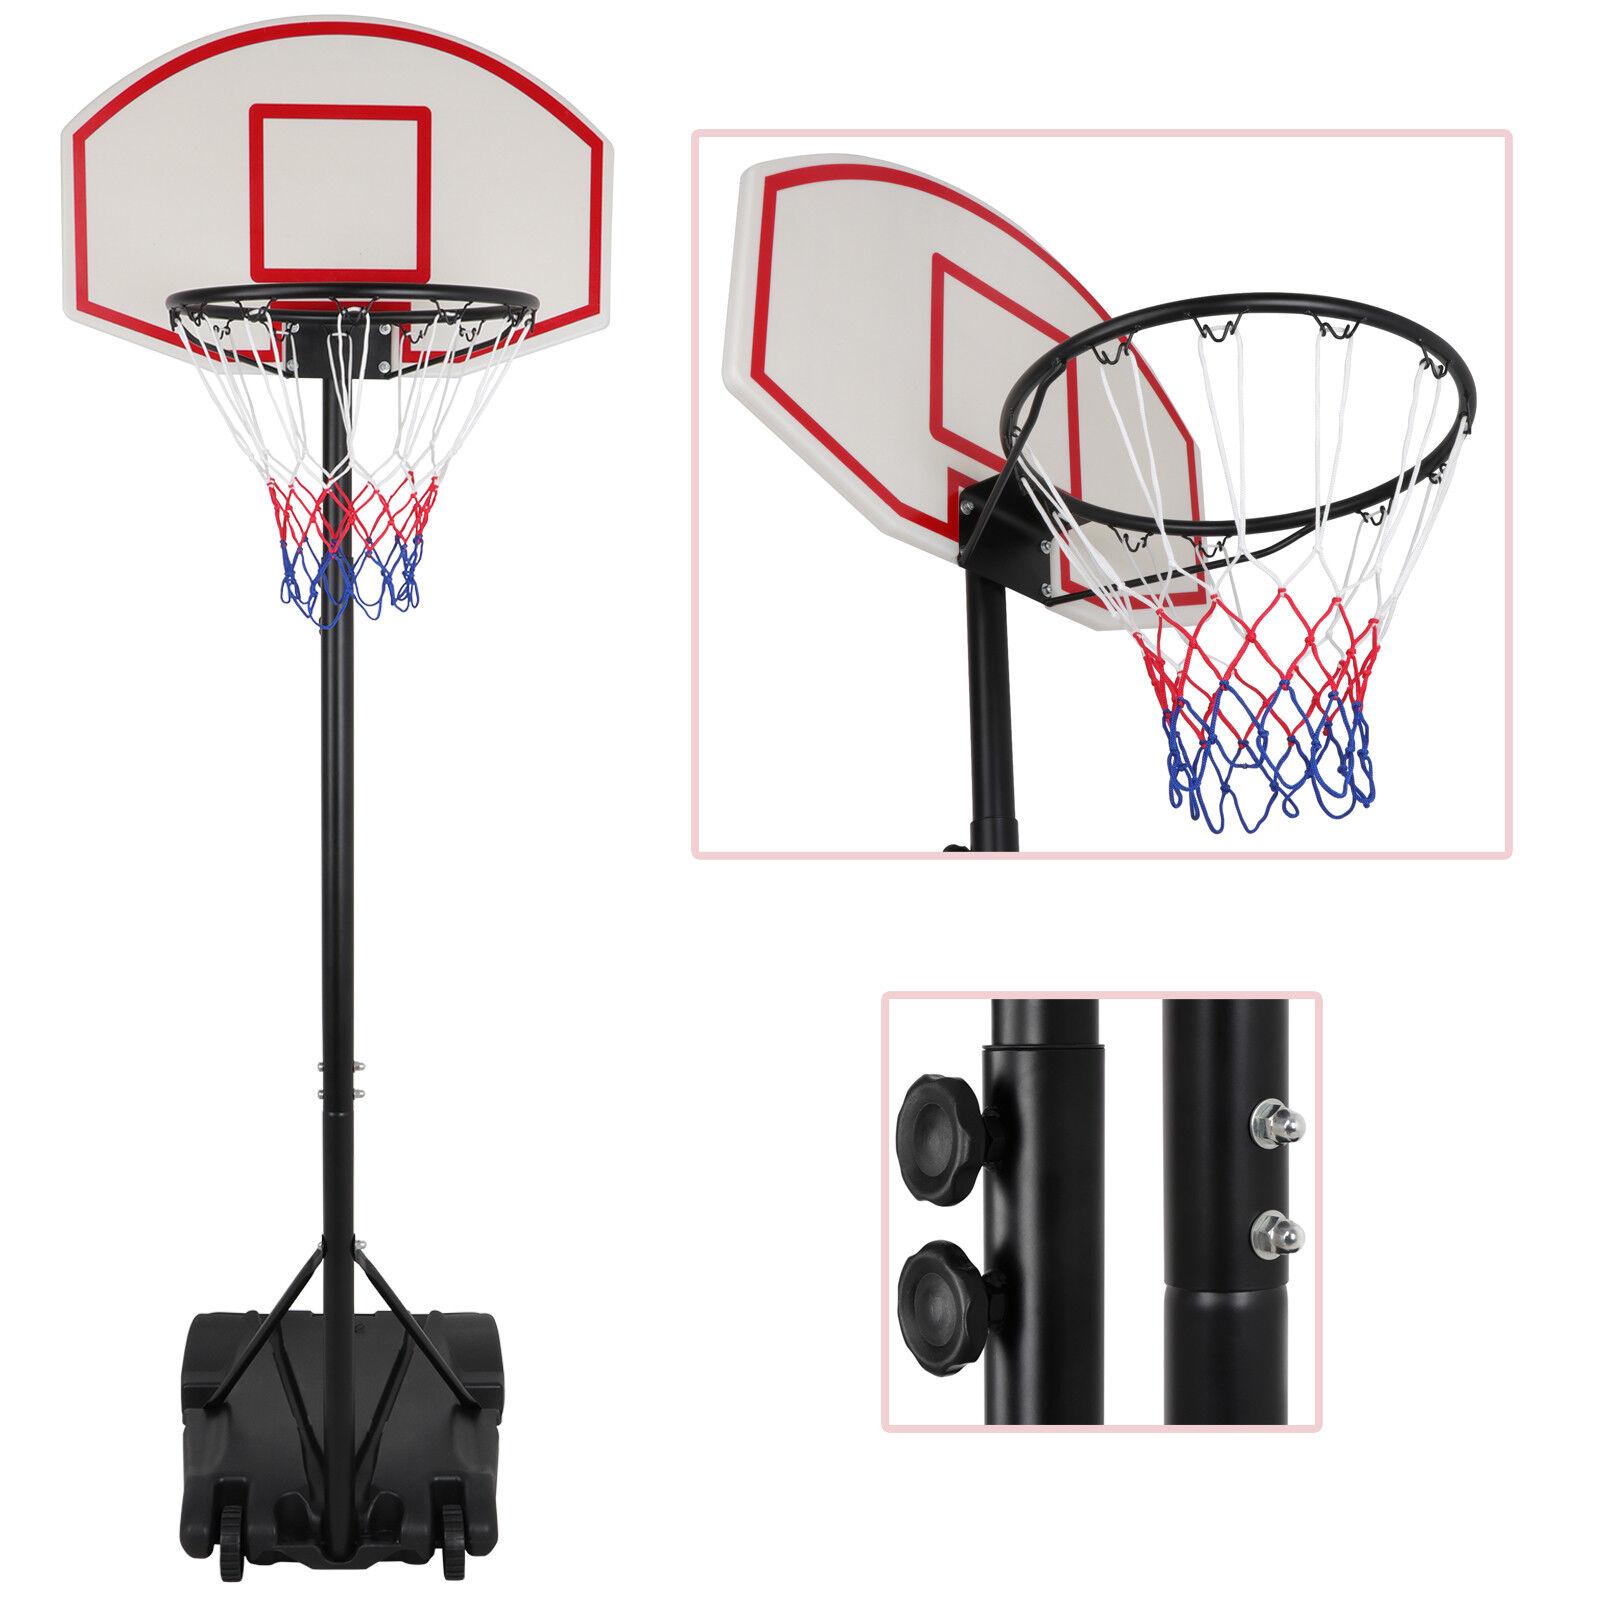 Portable Adjustable Basketball System Hoop Backboard Yard Outdoor Kids Sports Backboard Systems